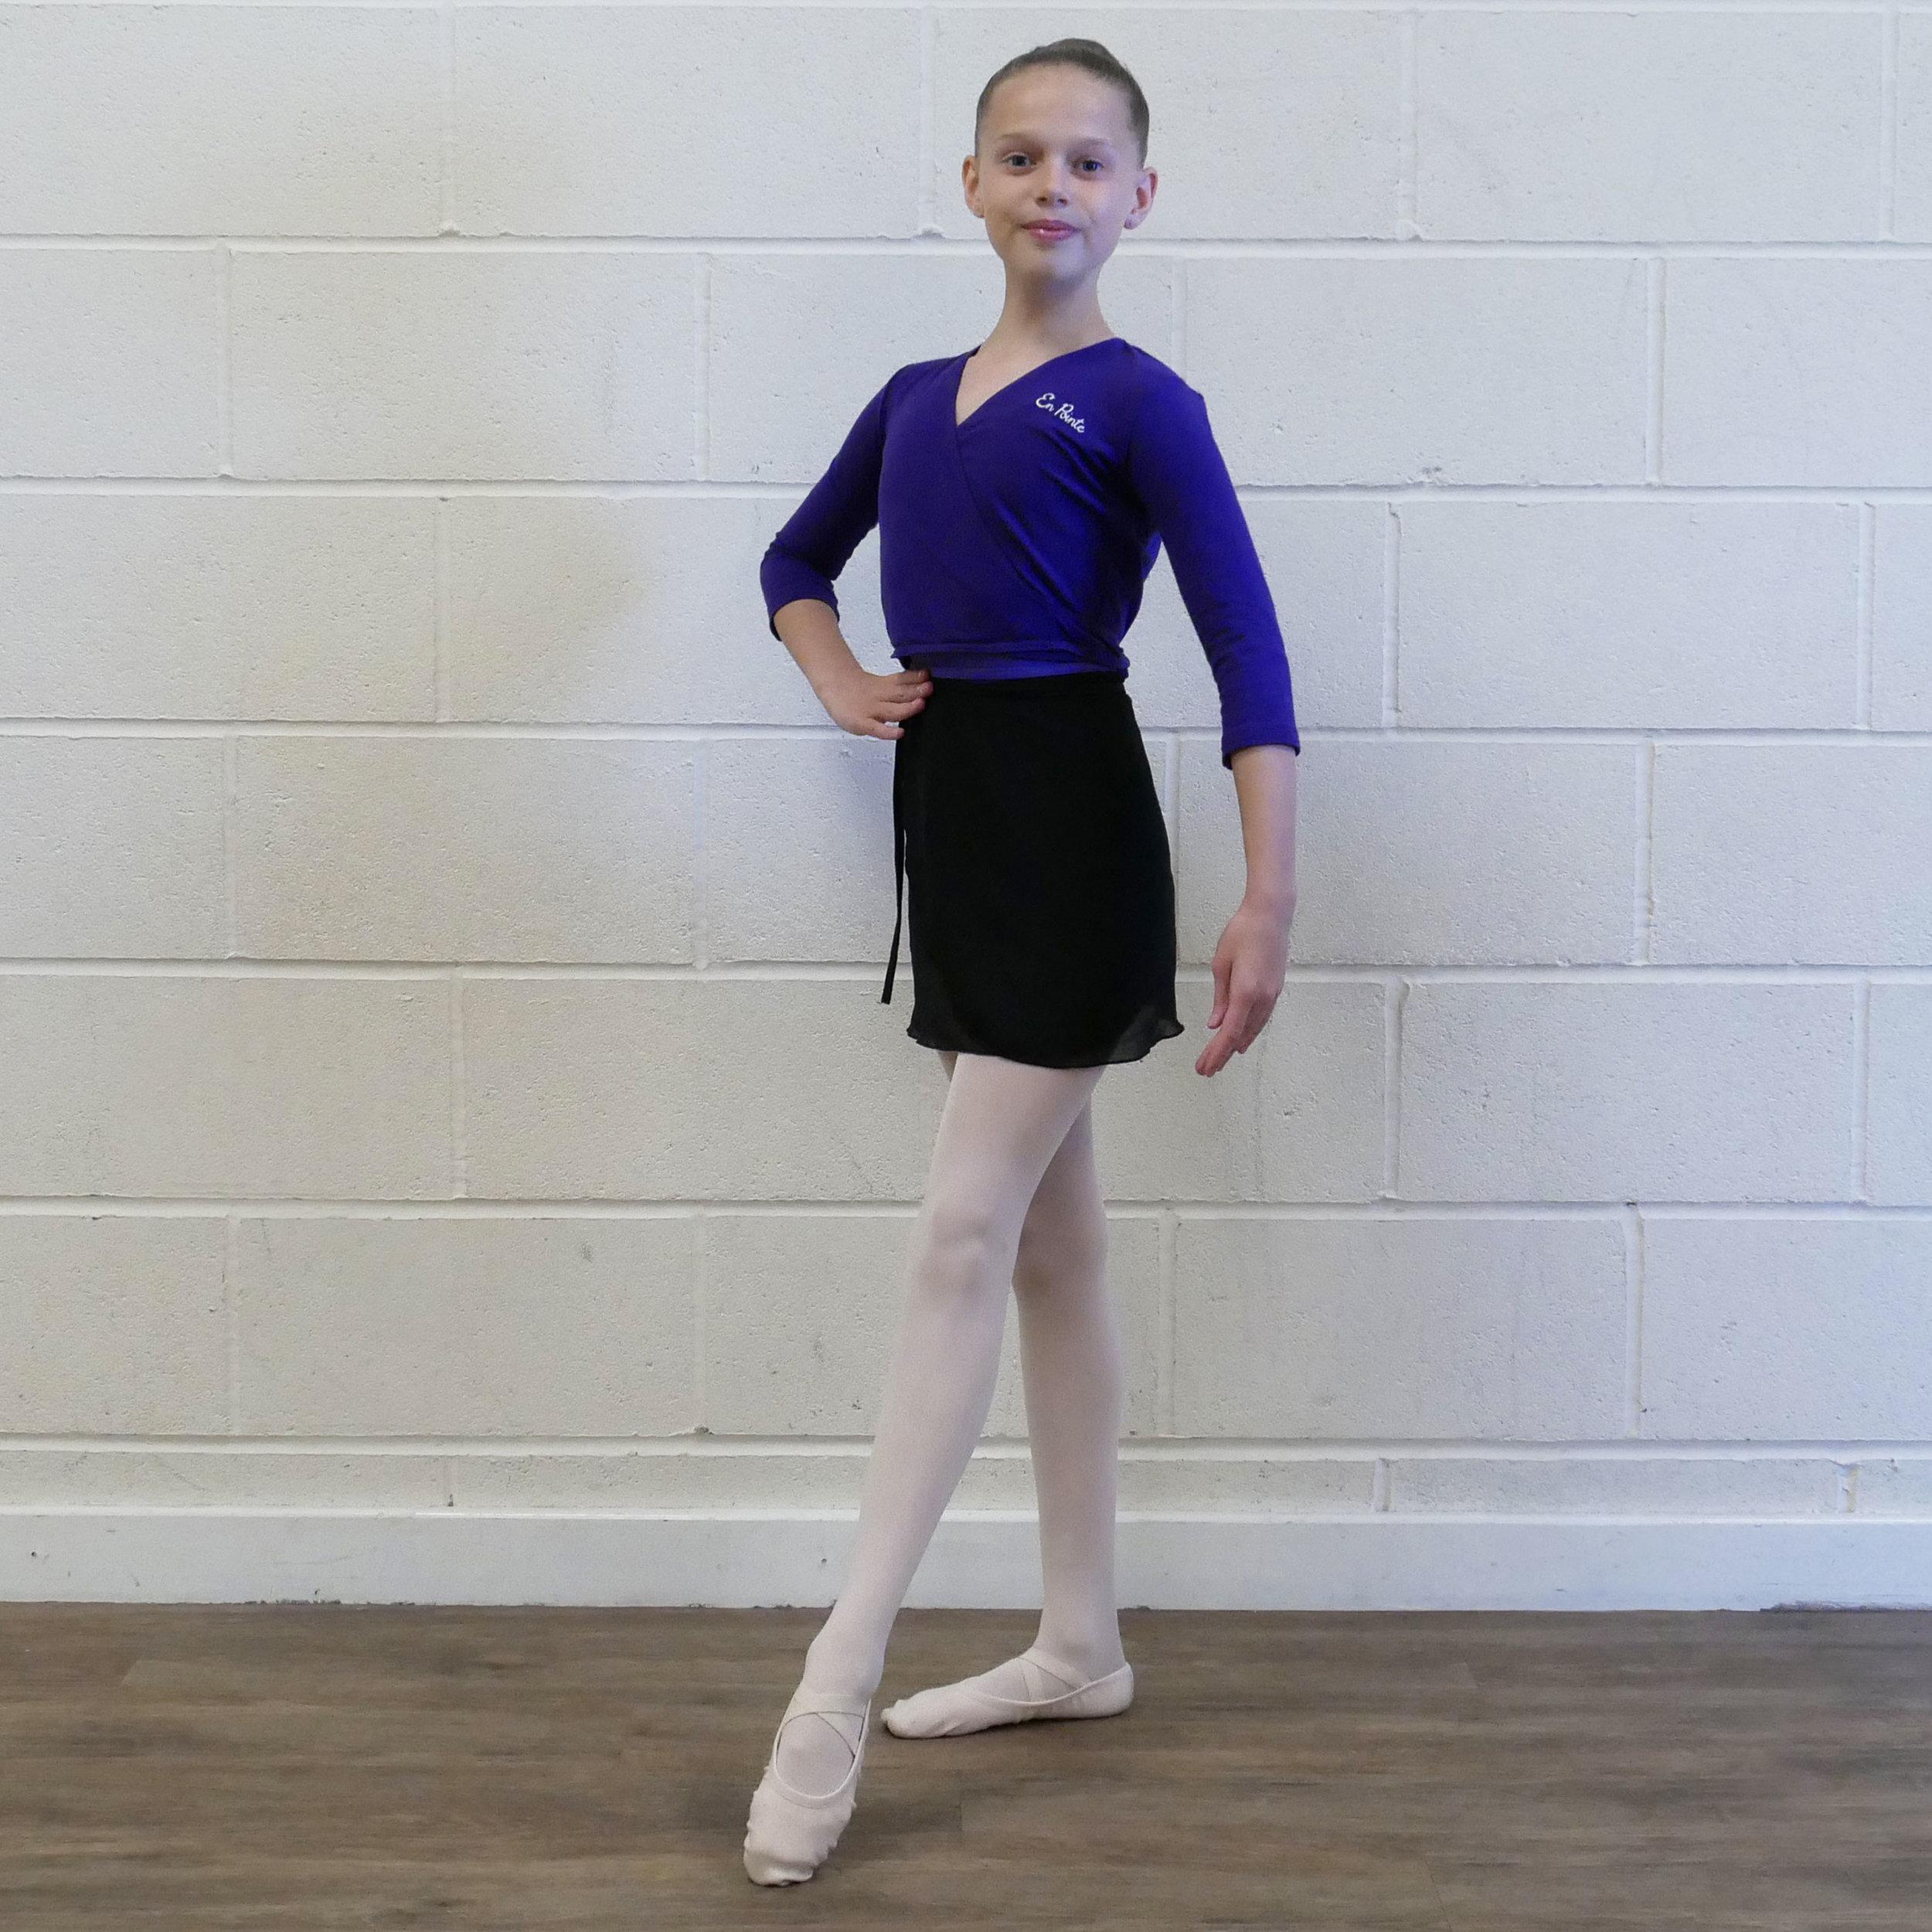 Royal Academy of Dance Grade 5 Ballet Dancer